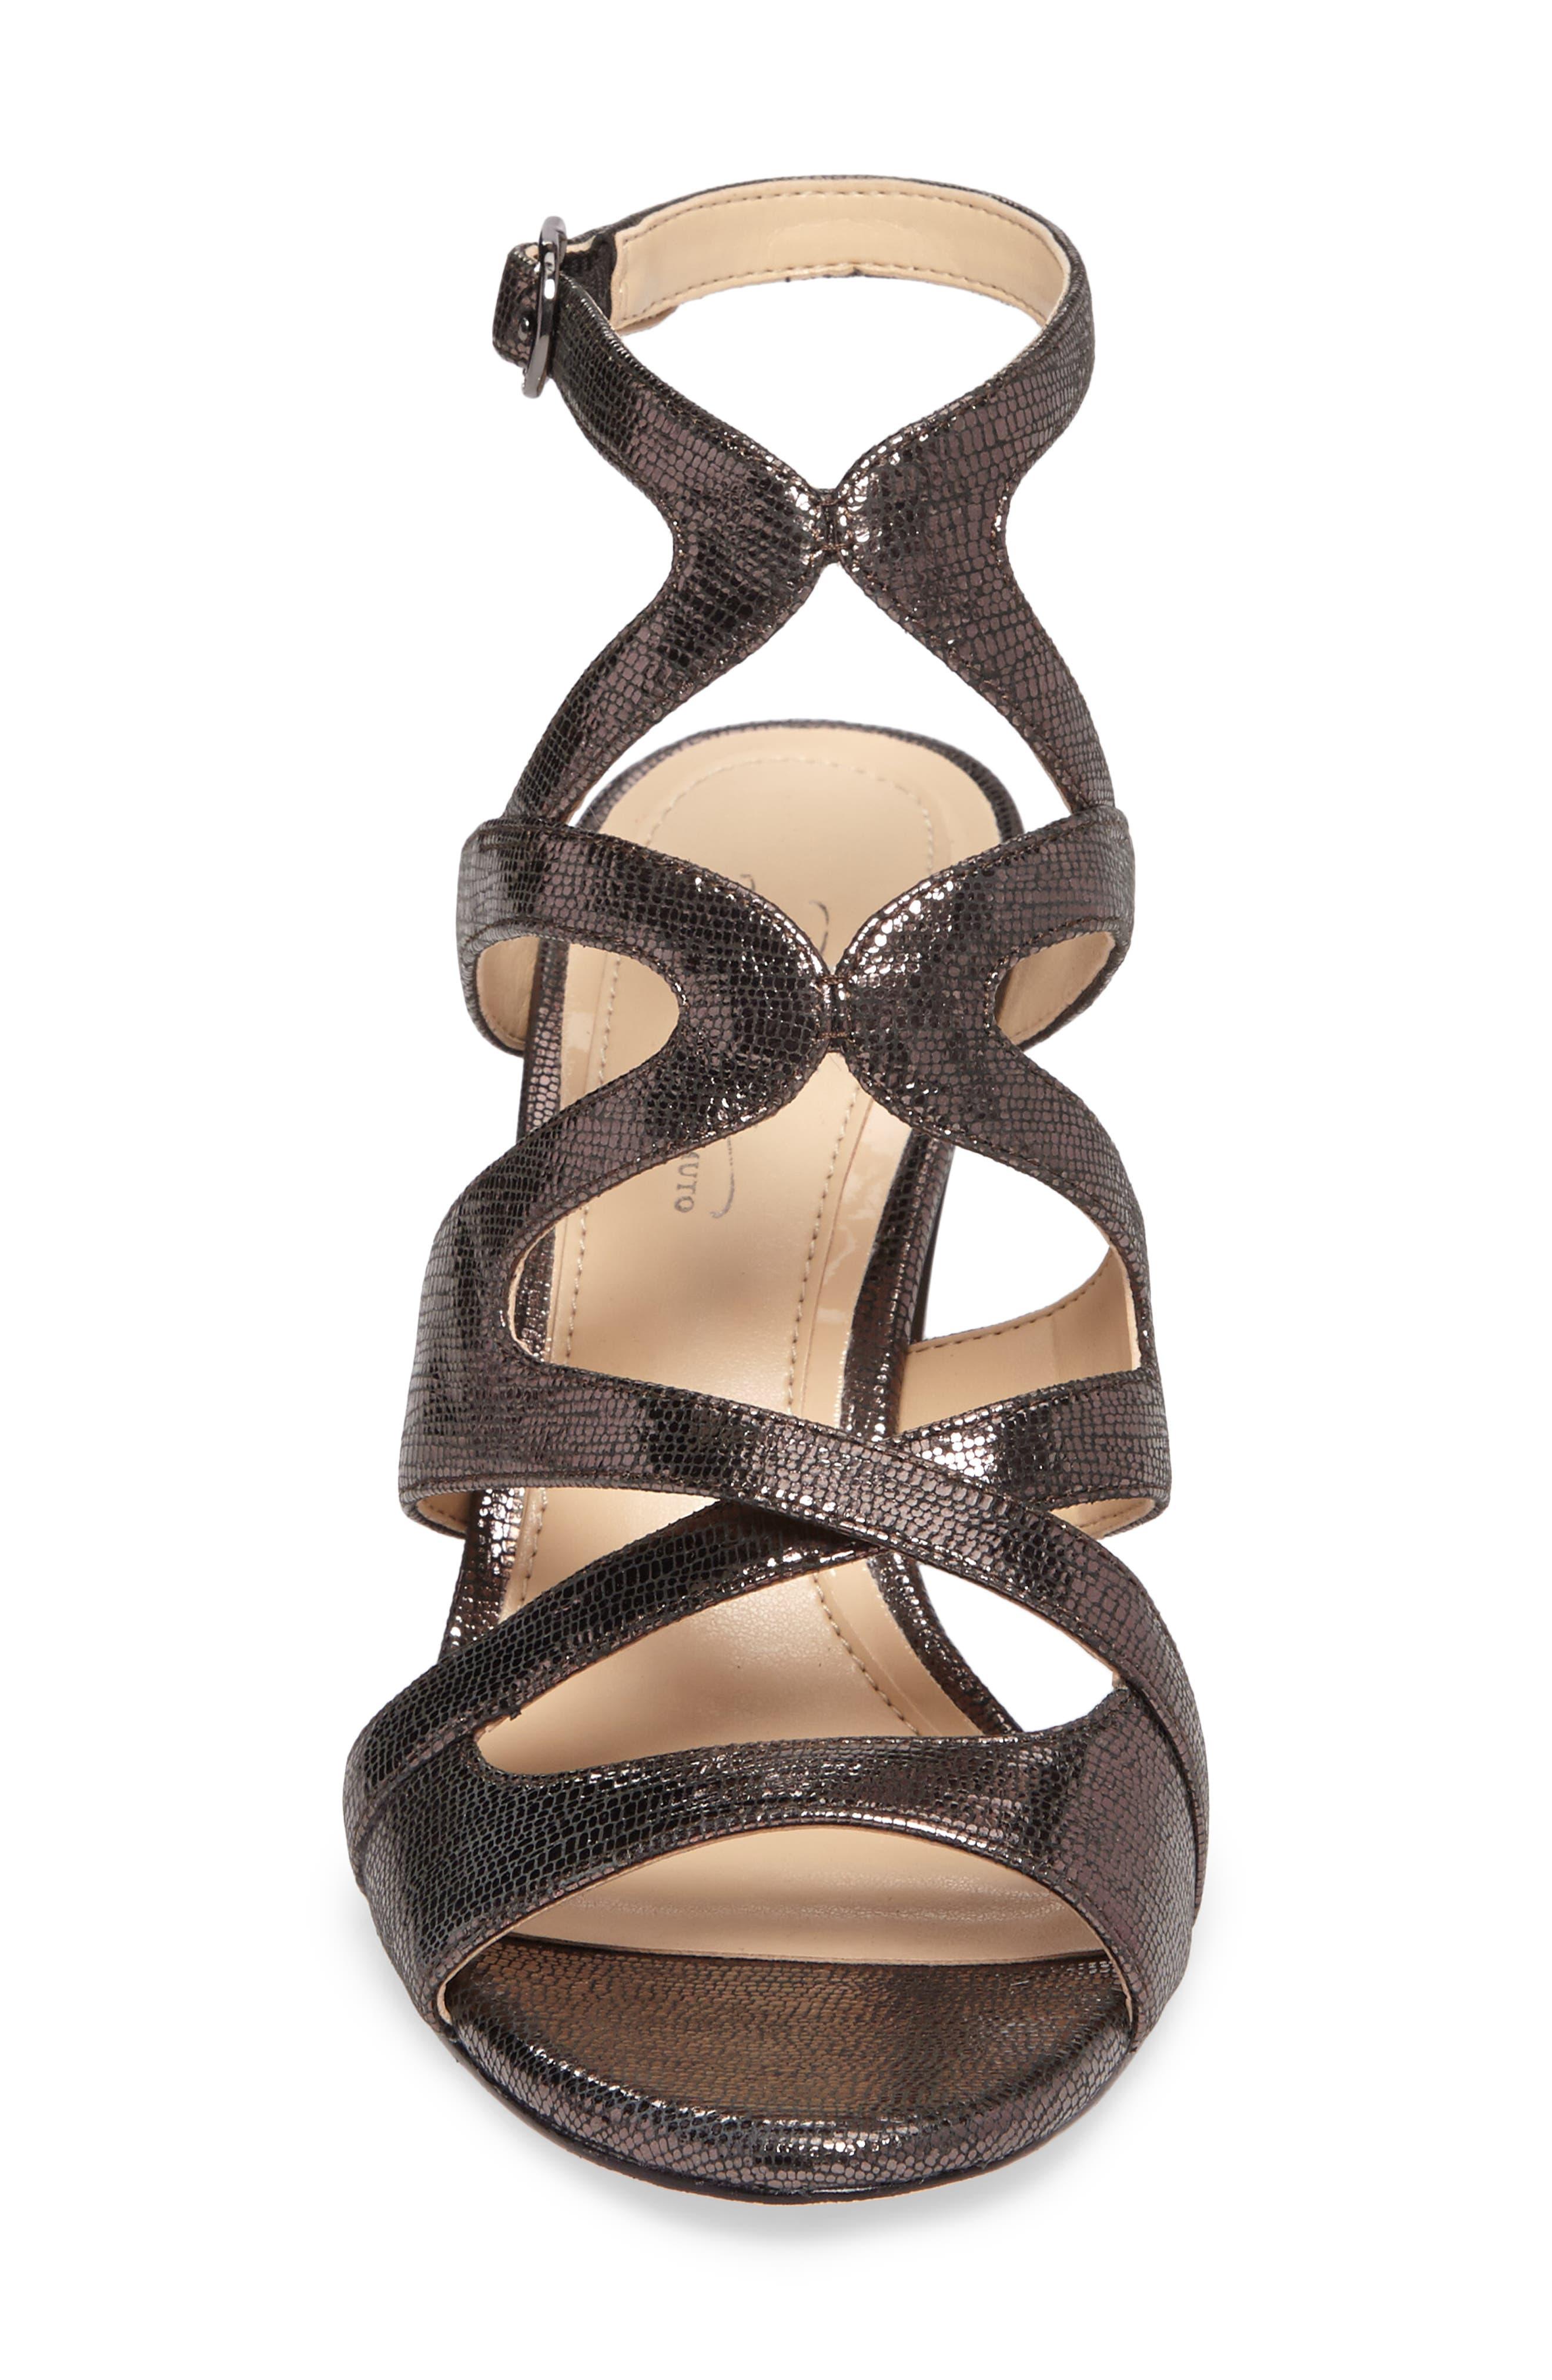 Imagine Vince Camuto Zahira Statement Heel Sandal,                             Alternate thumbnail 7, color,